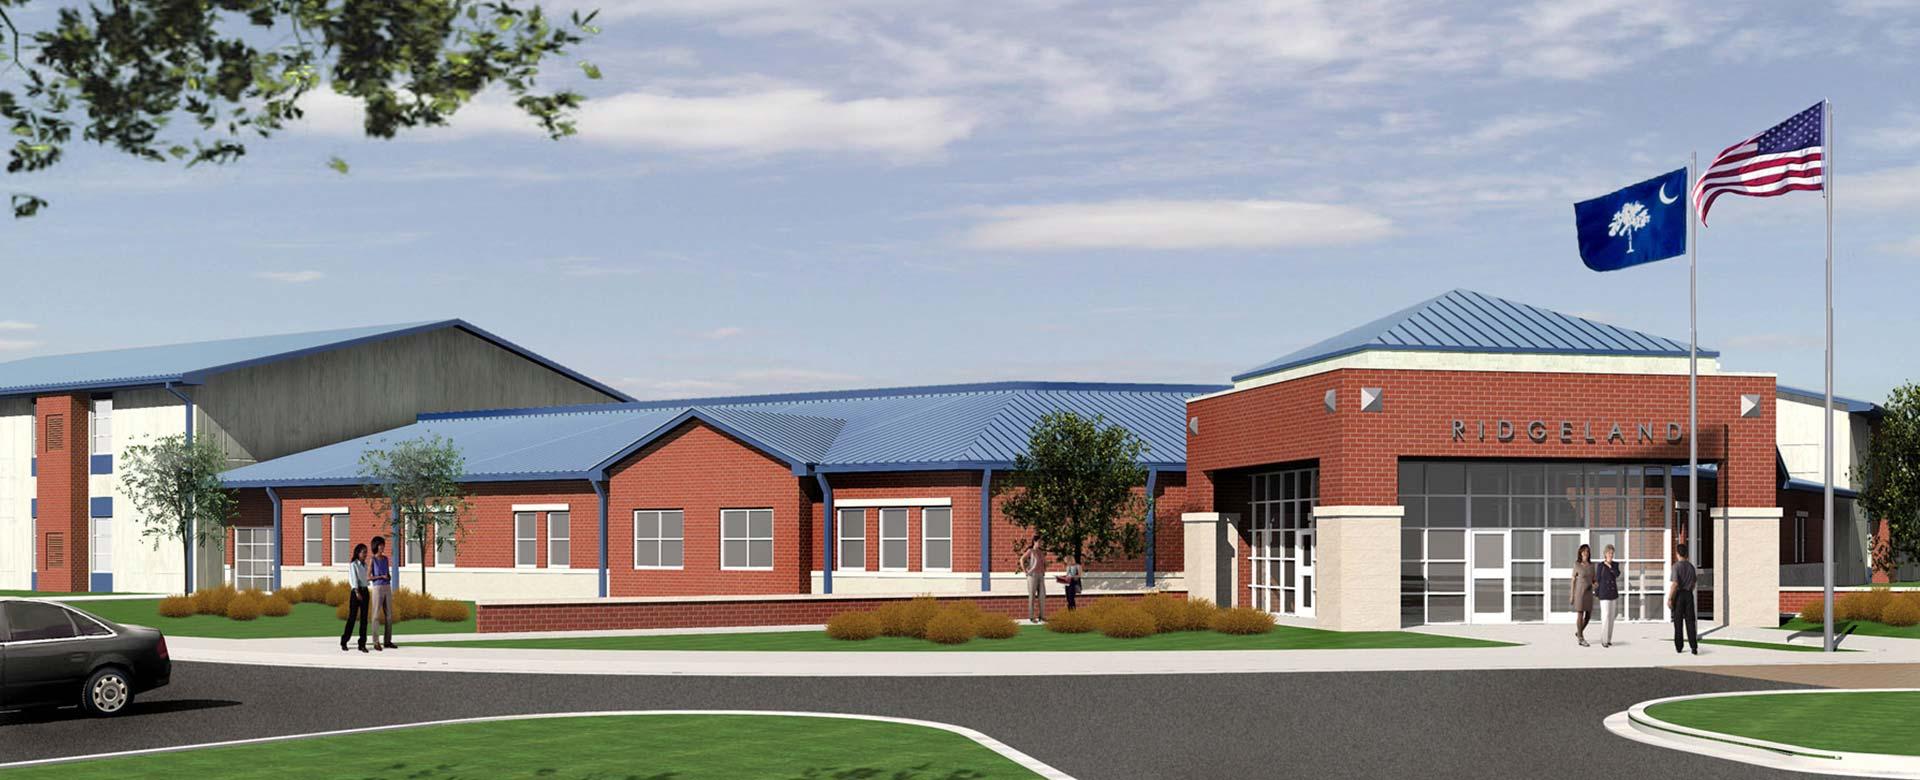 Ridgeland K 12 School Michael M Simpson Amp Associates